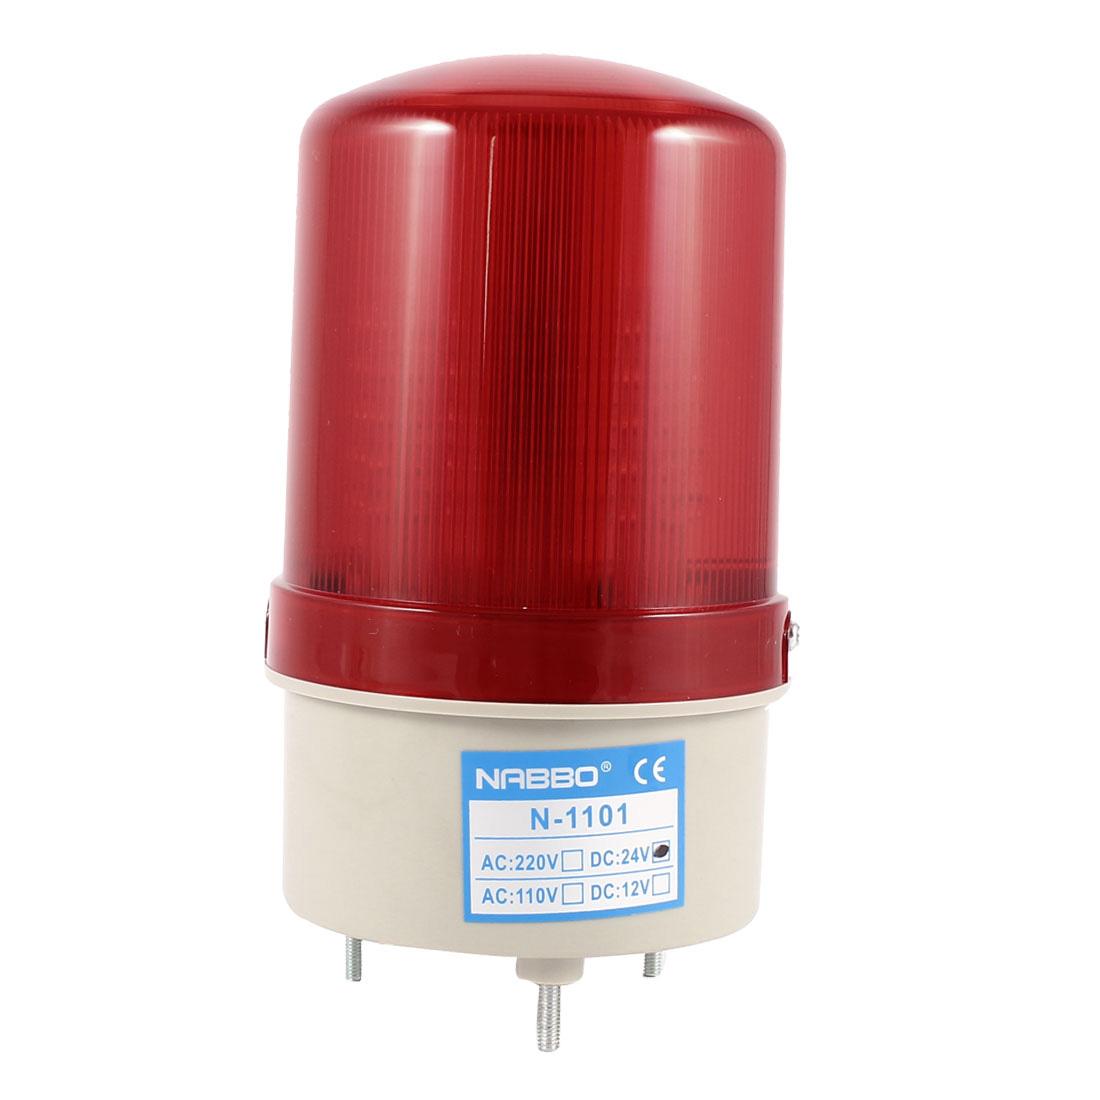 Industrial DC 24V Red LED Blinking Rotating Warning Light Bulb Signal Tower Lamp